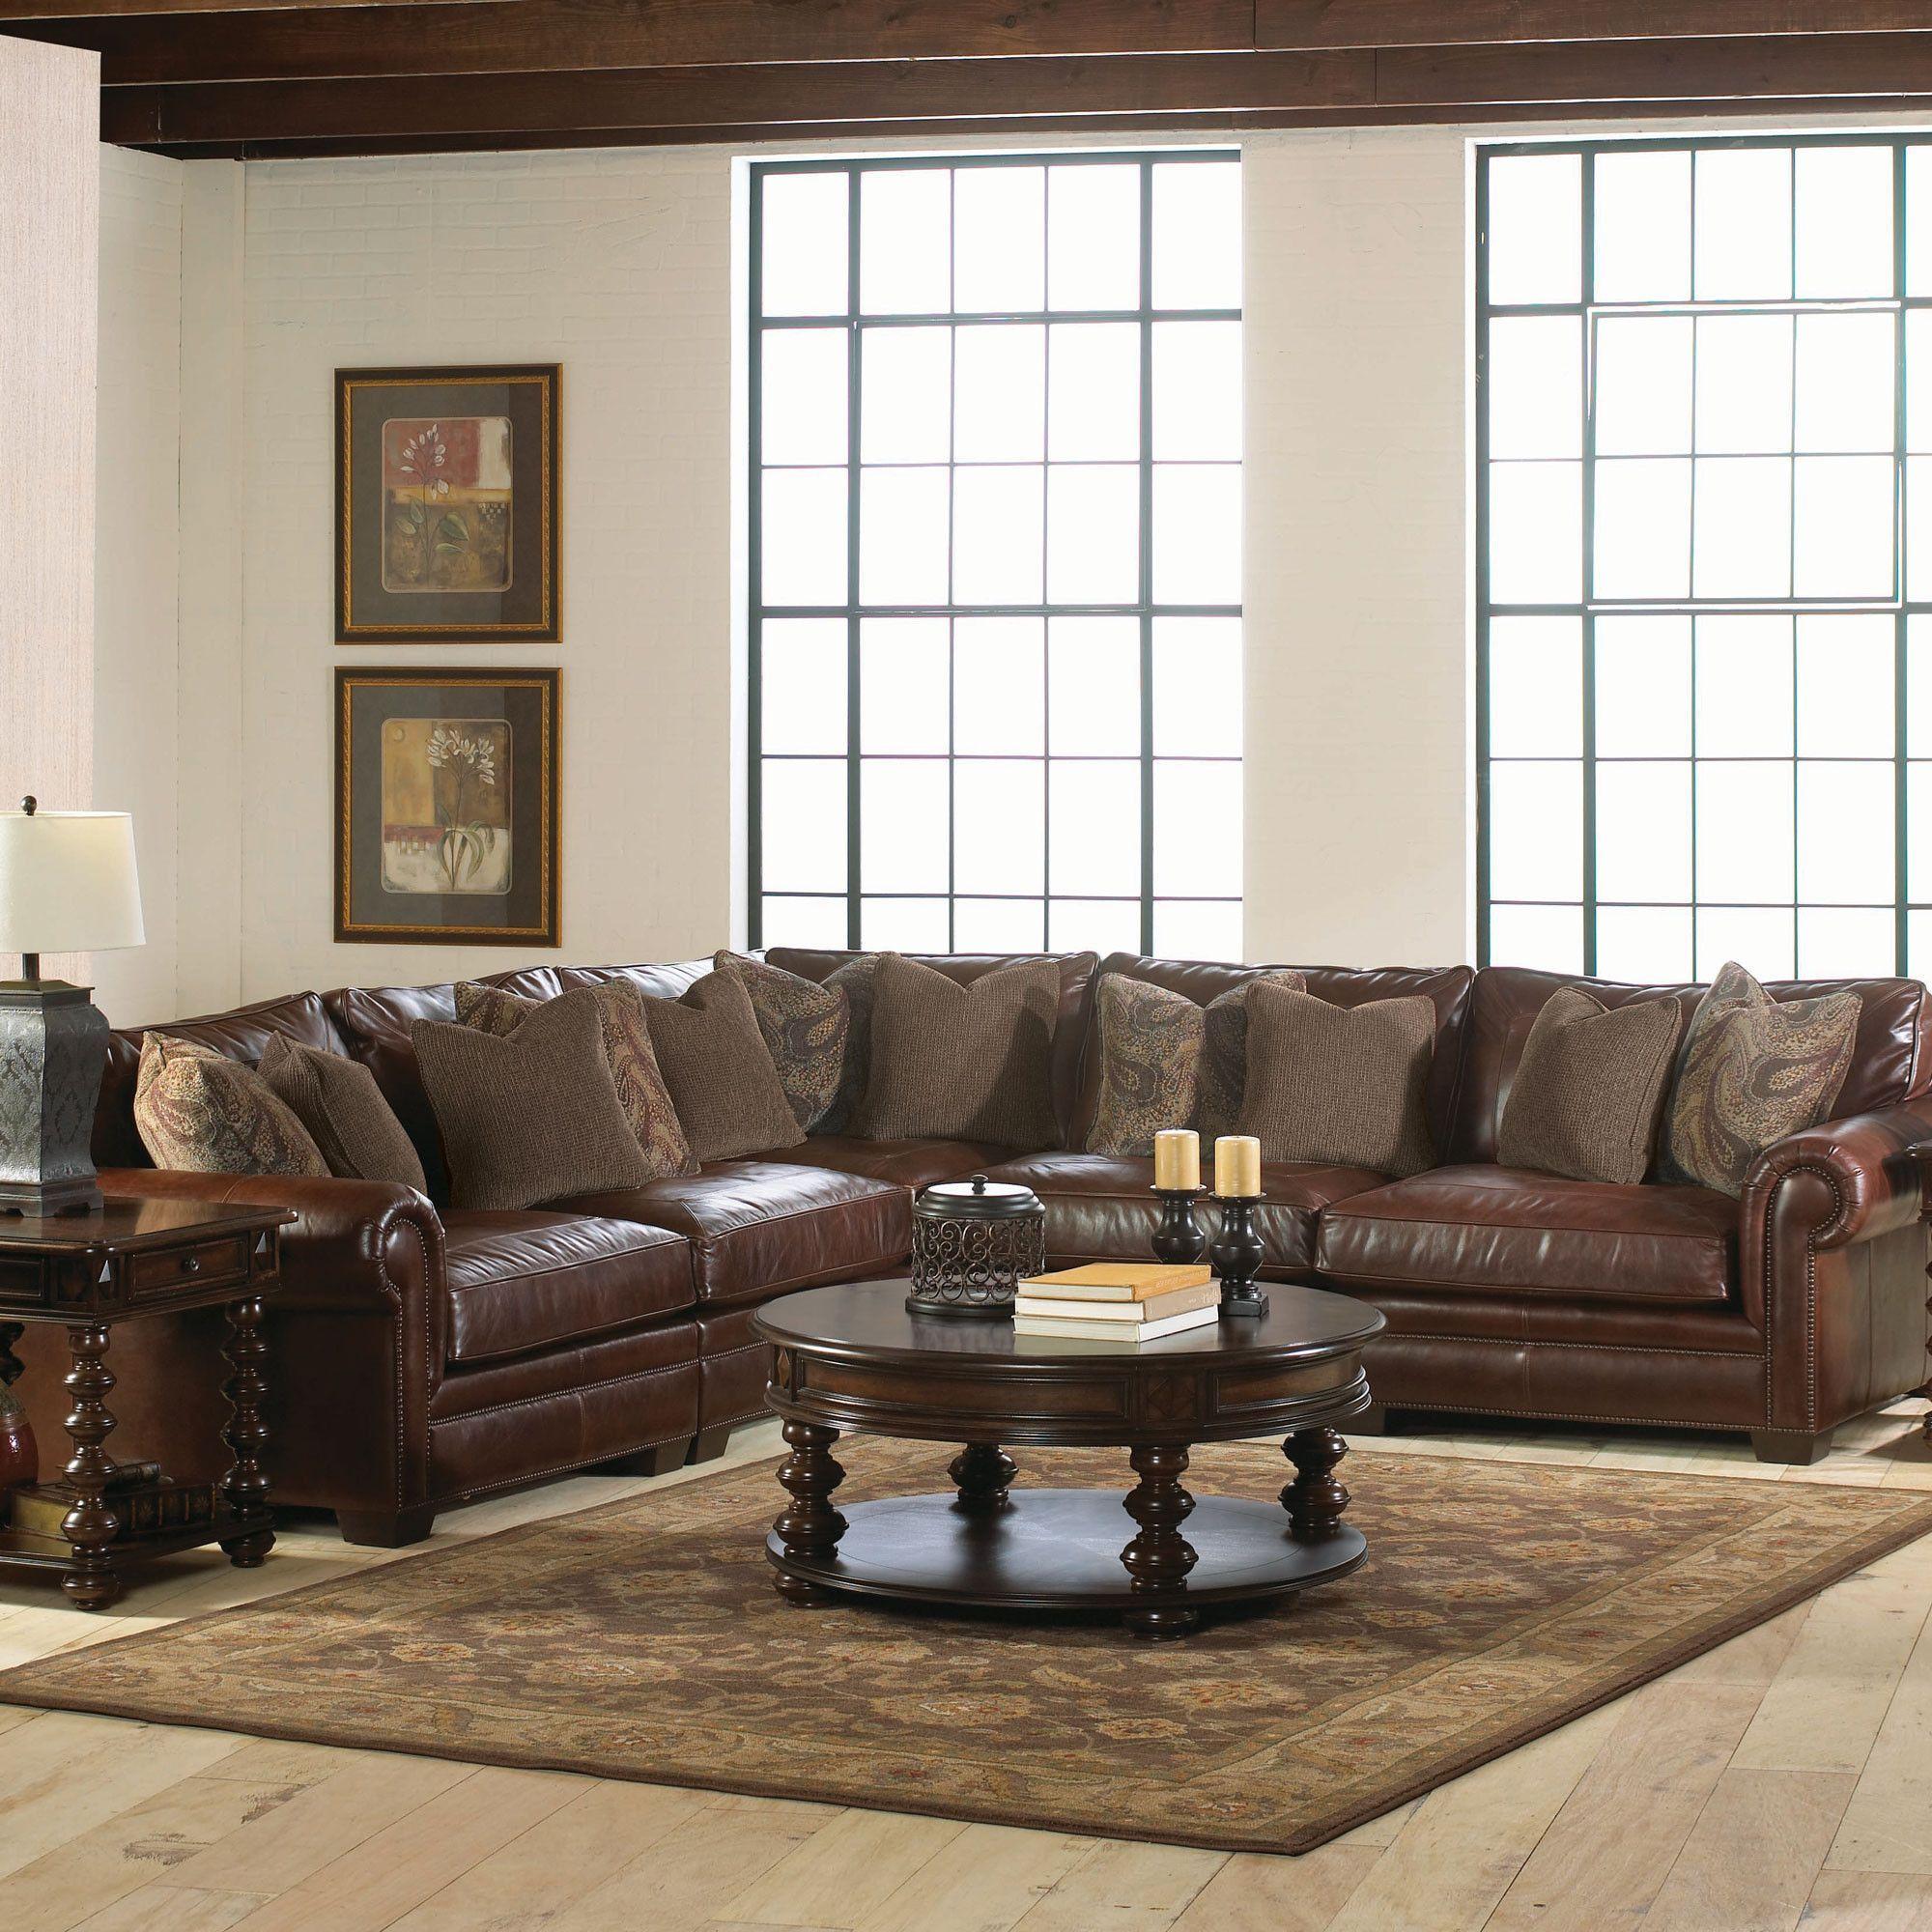 Living Room Sectional: Grandview by Bernhardt at Kensington ...